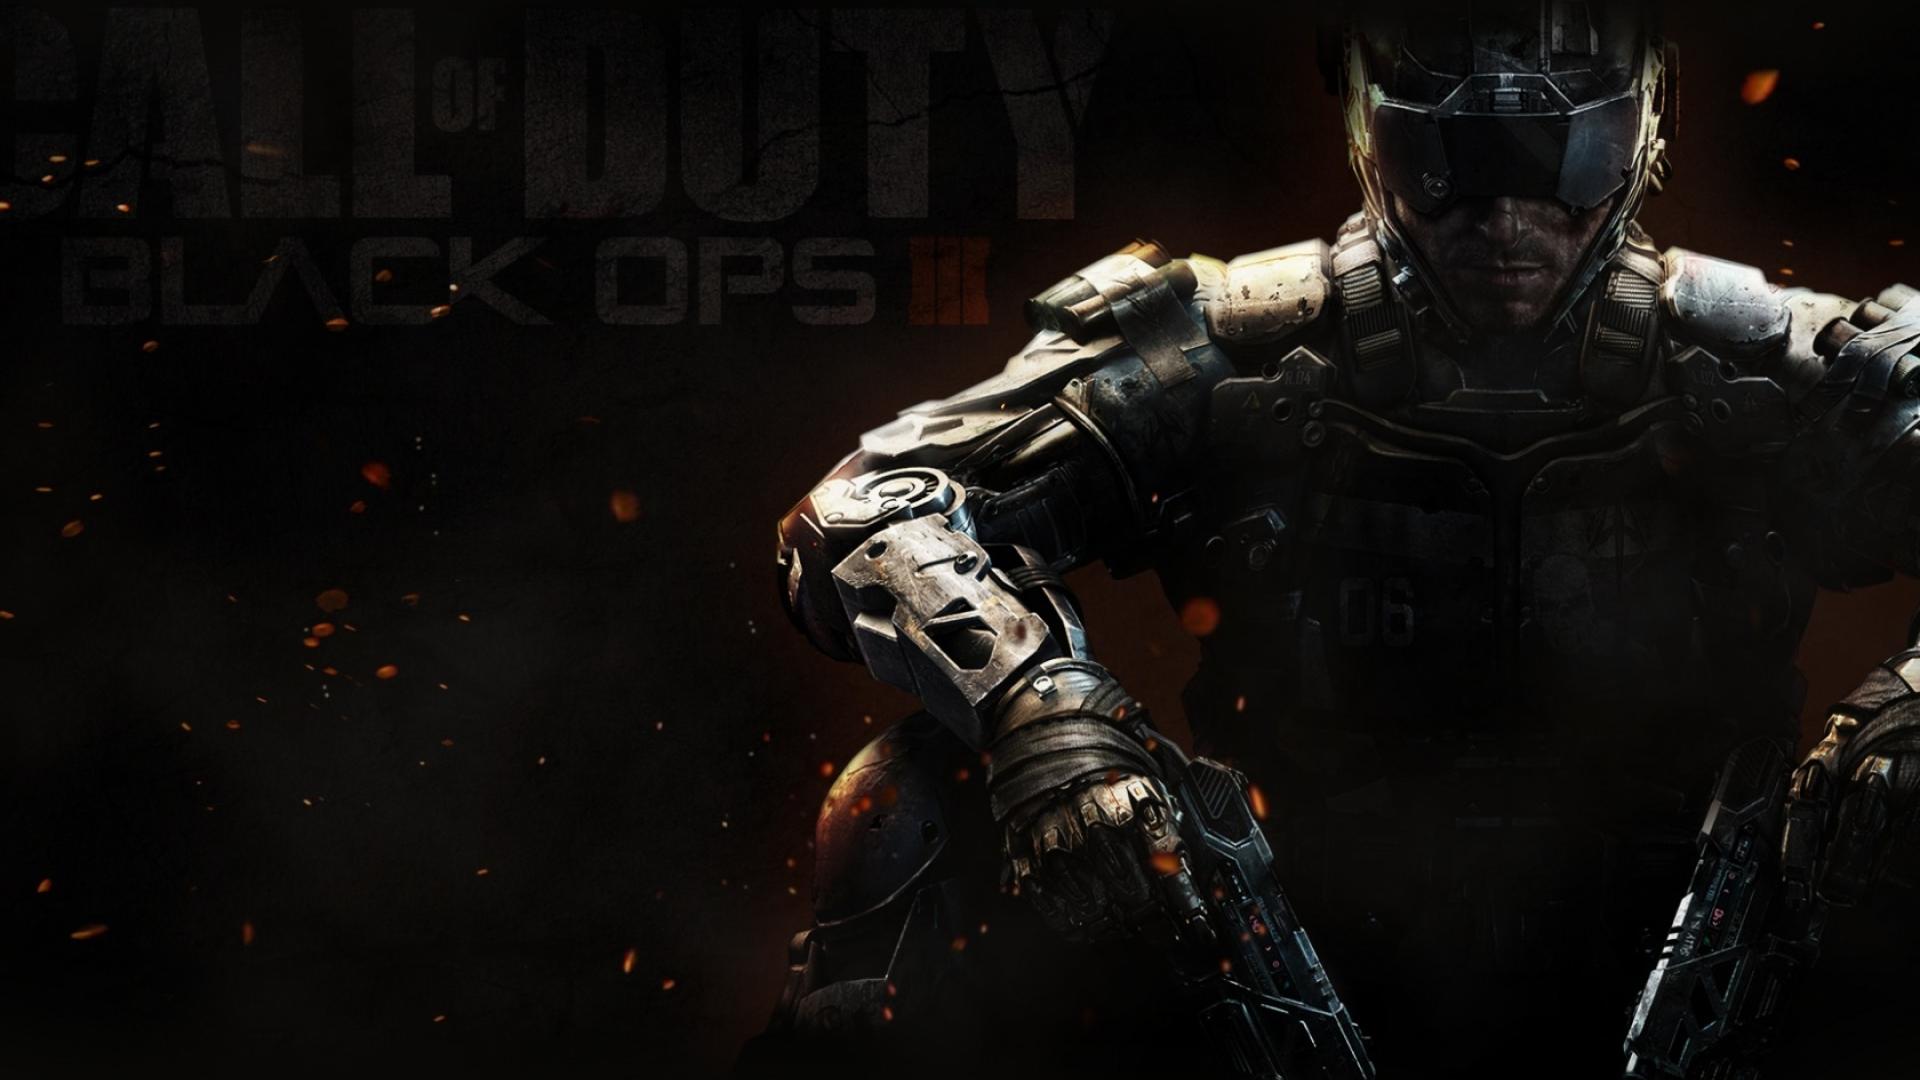 1920x1080 Call Of Duty Black Ops 3 Call Of Duty Black Ops 3